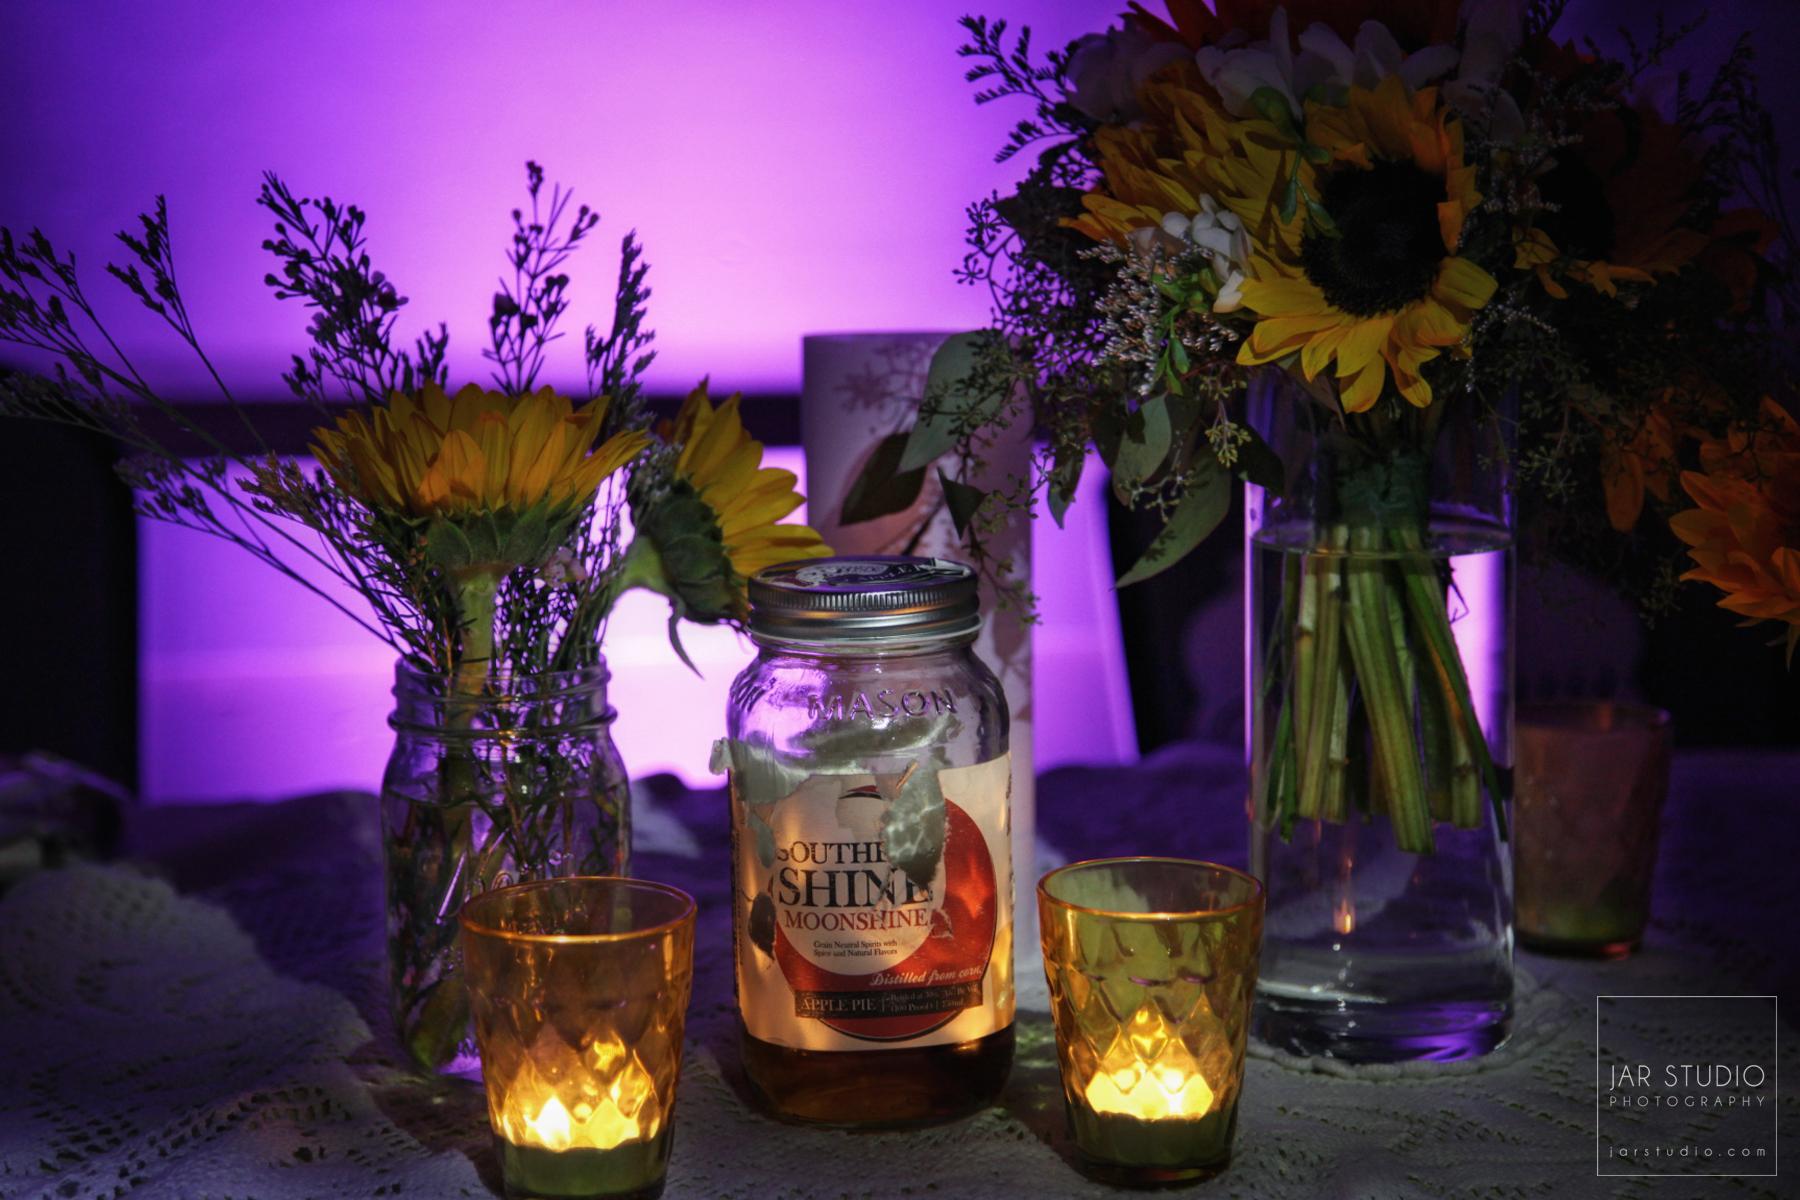 25-orlando-weddings-reception-decor-jarstudio-photography.JPG